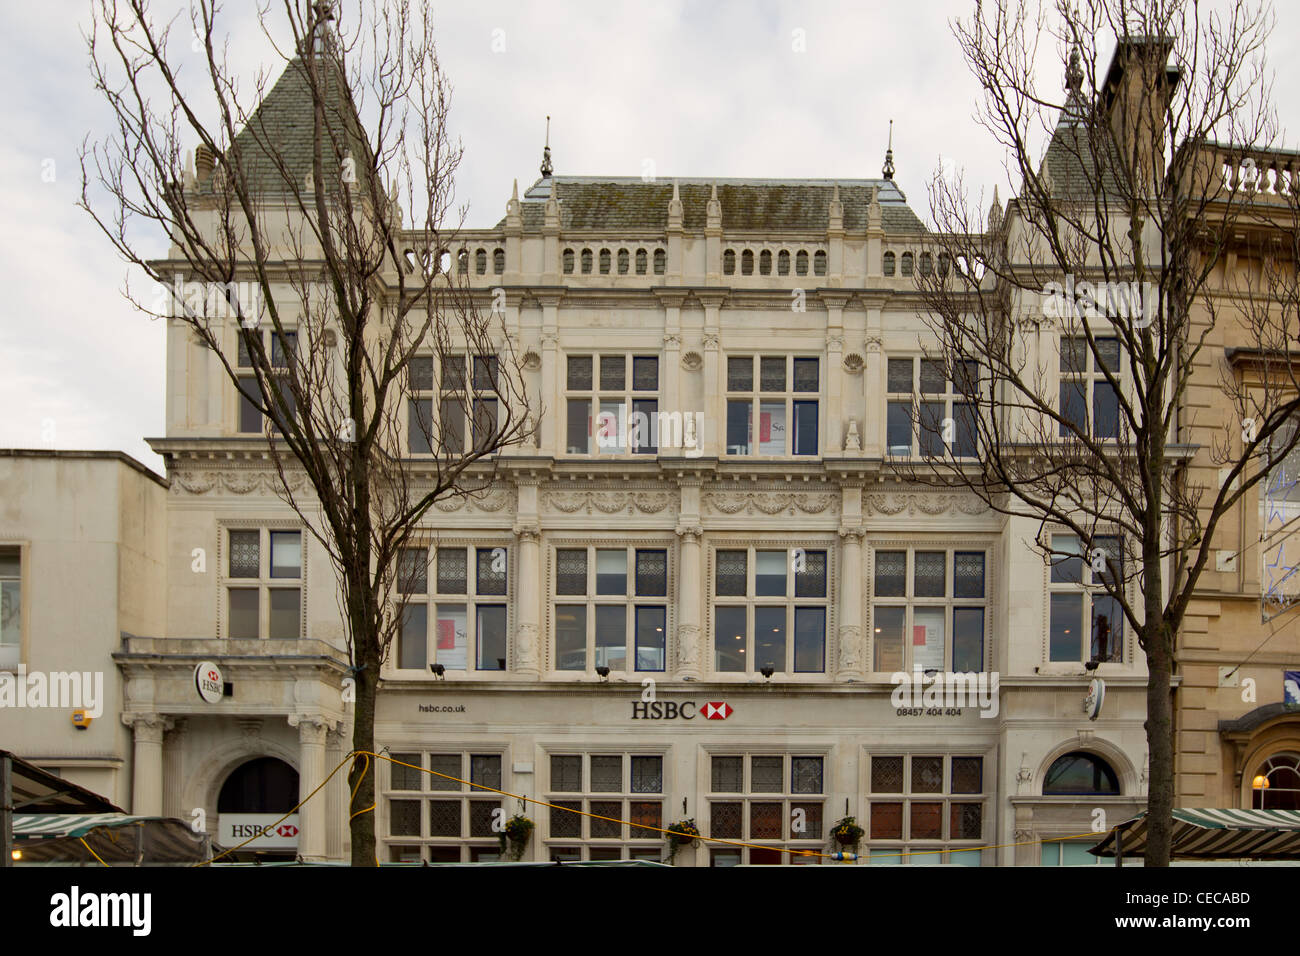 HSBC Bank   Architectural Studies Of Loughborough Buildings